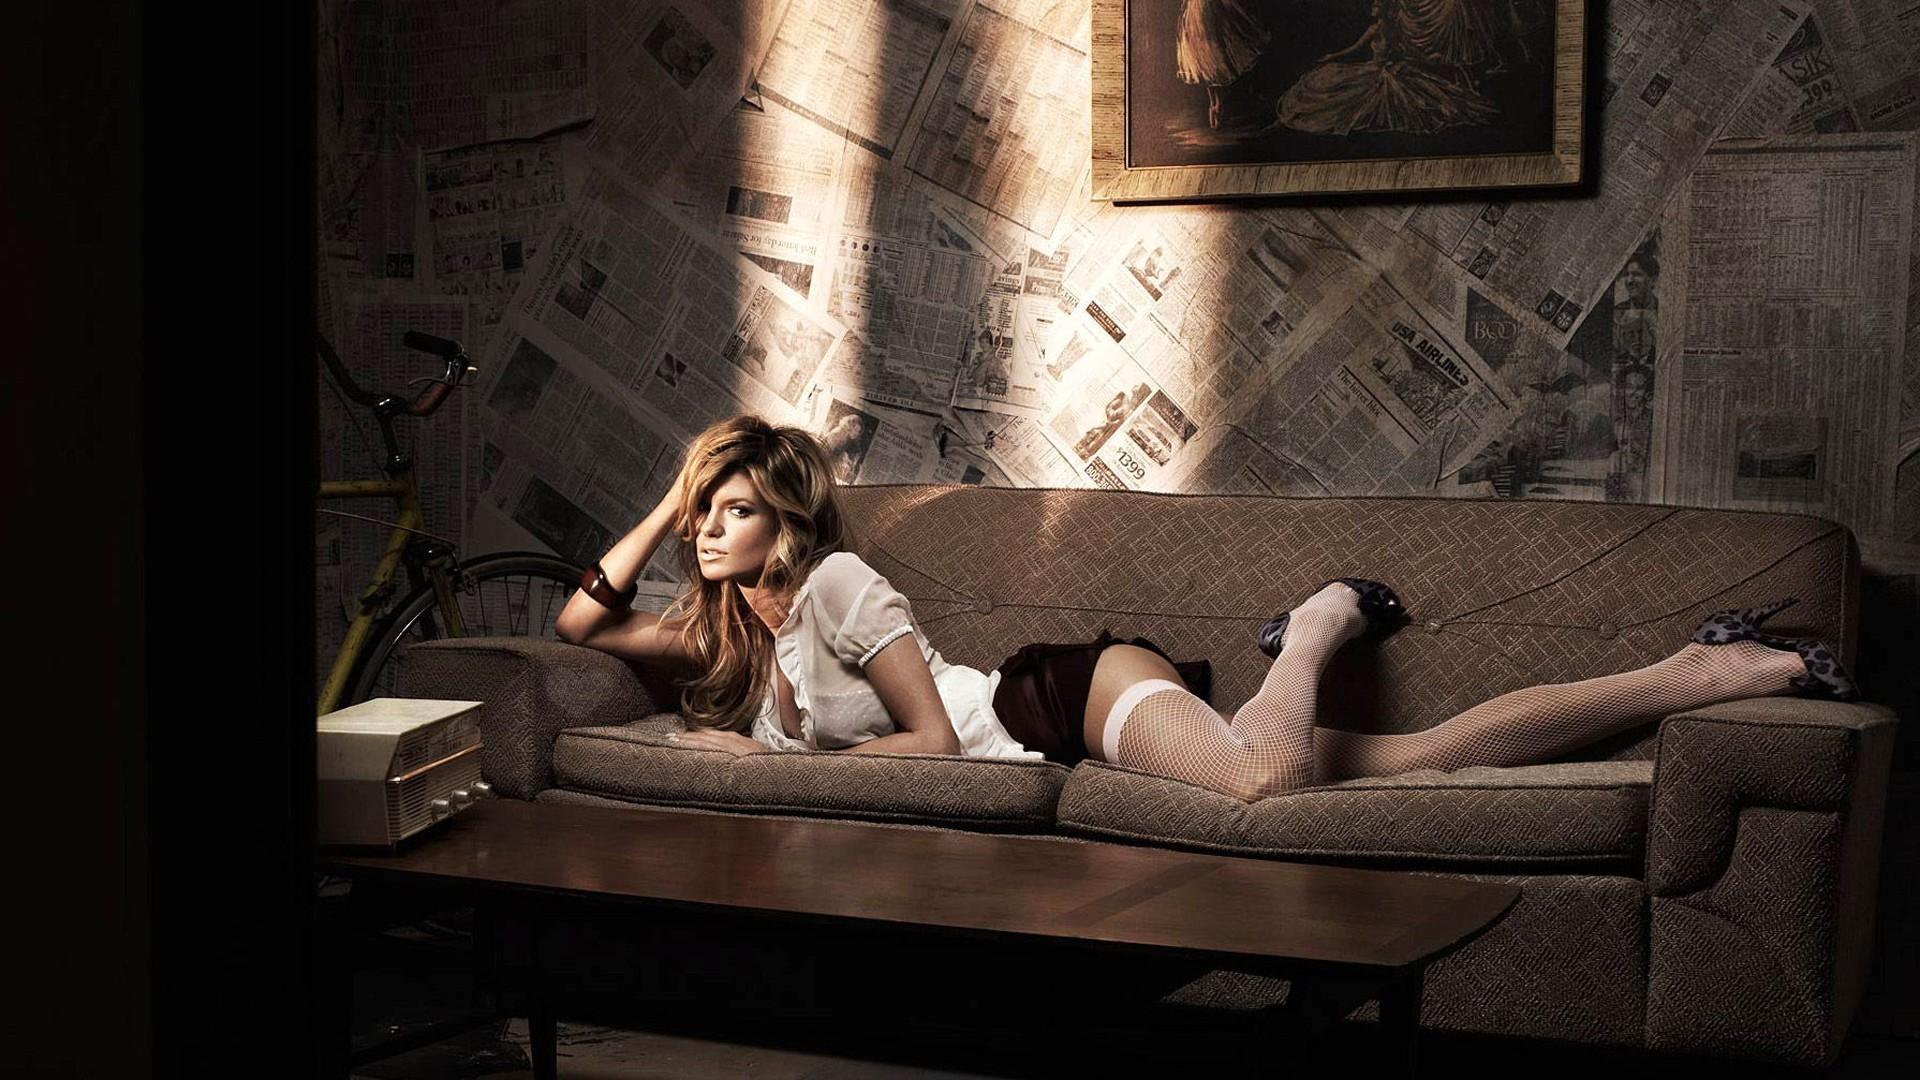 Marisa Lee Miller High Definition Wallpapers